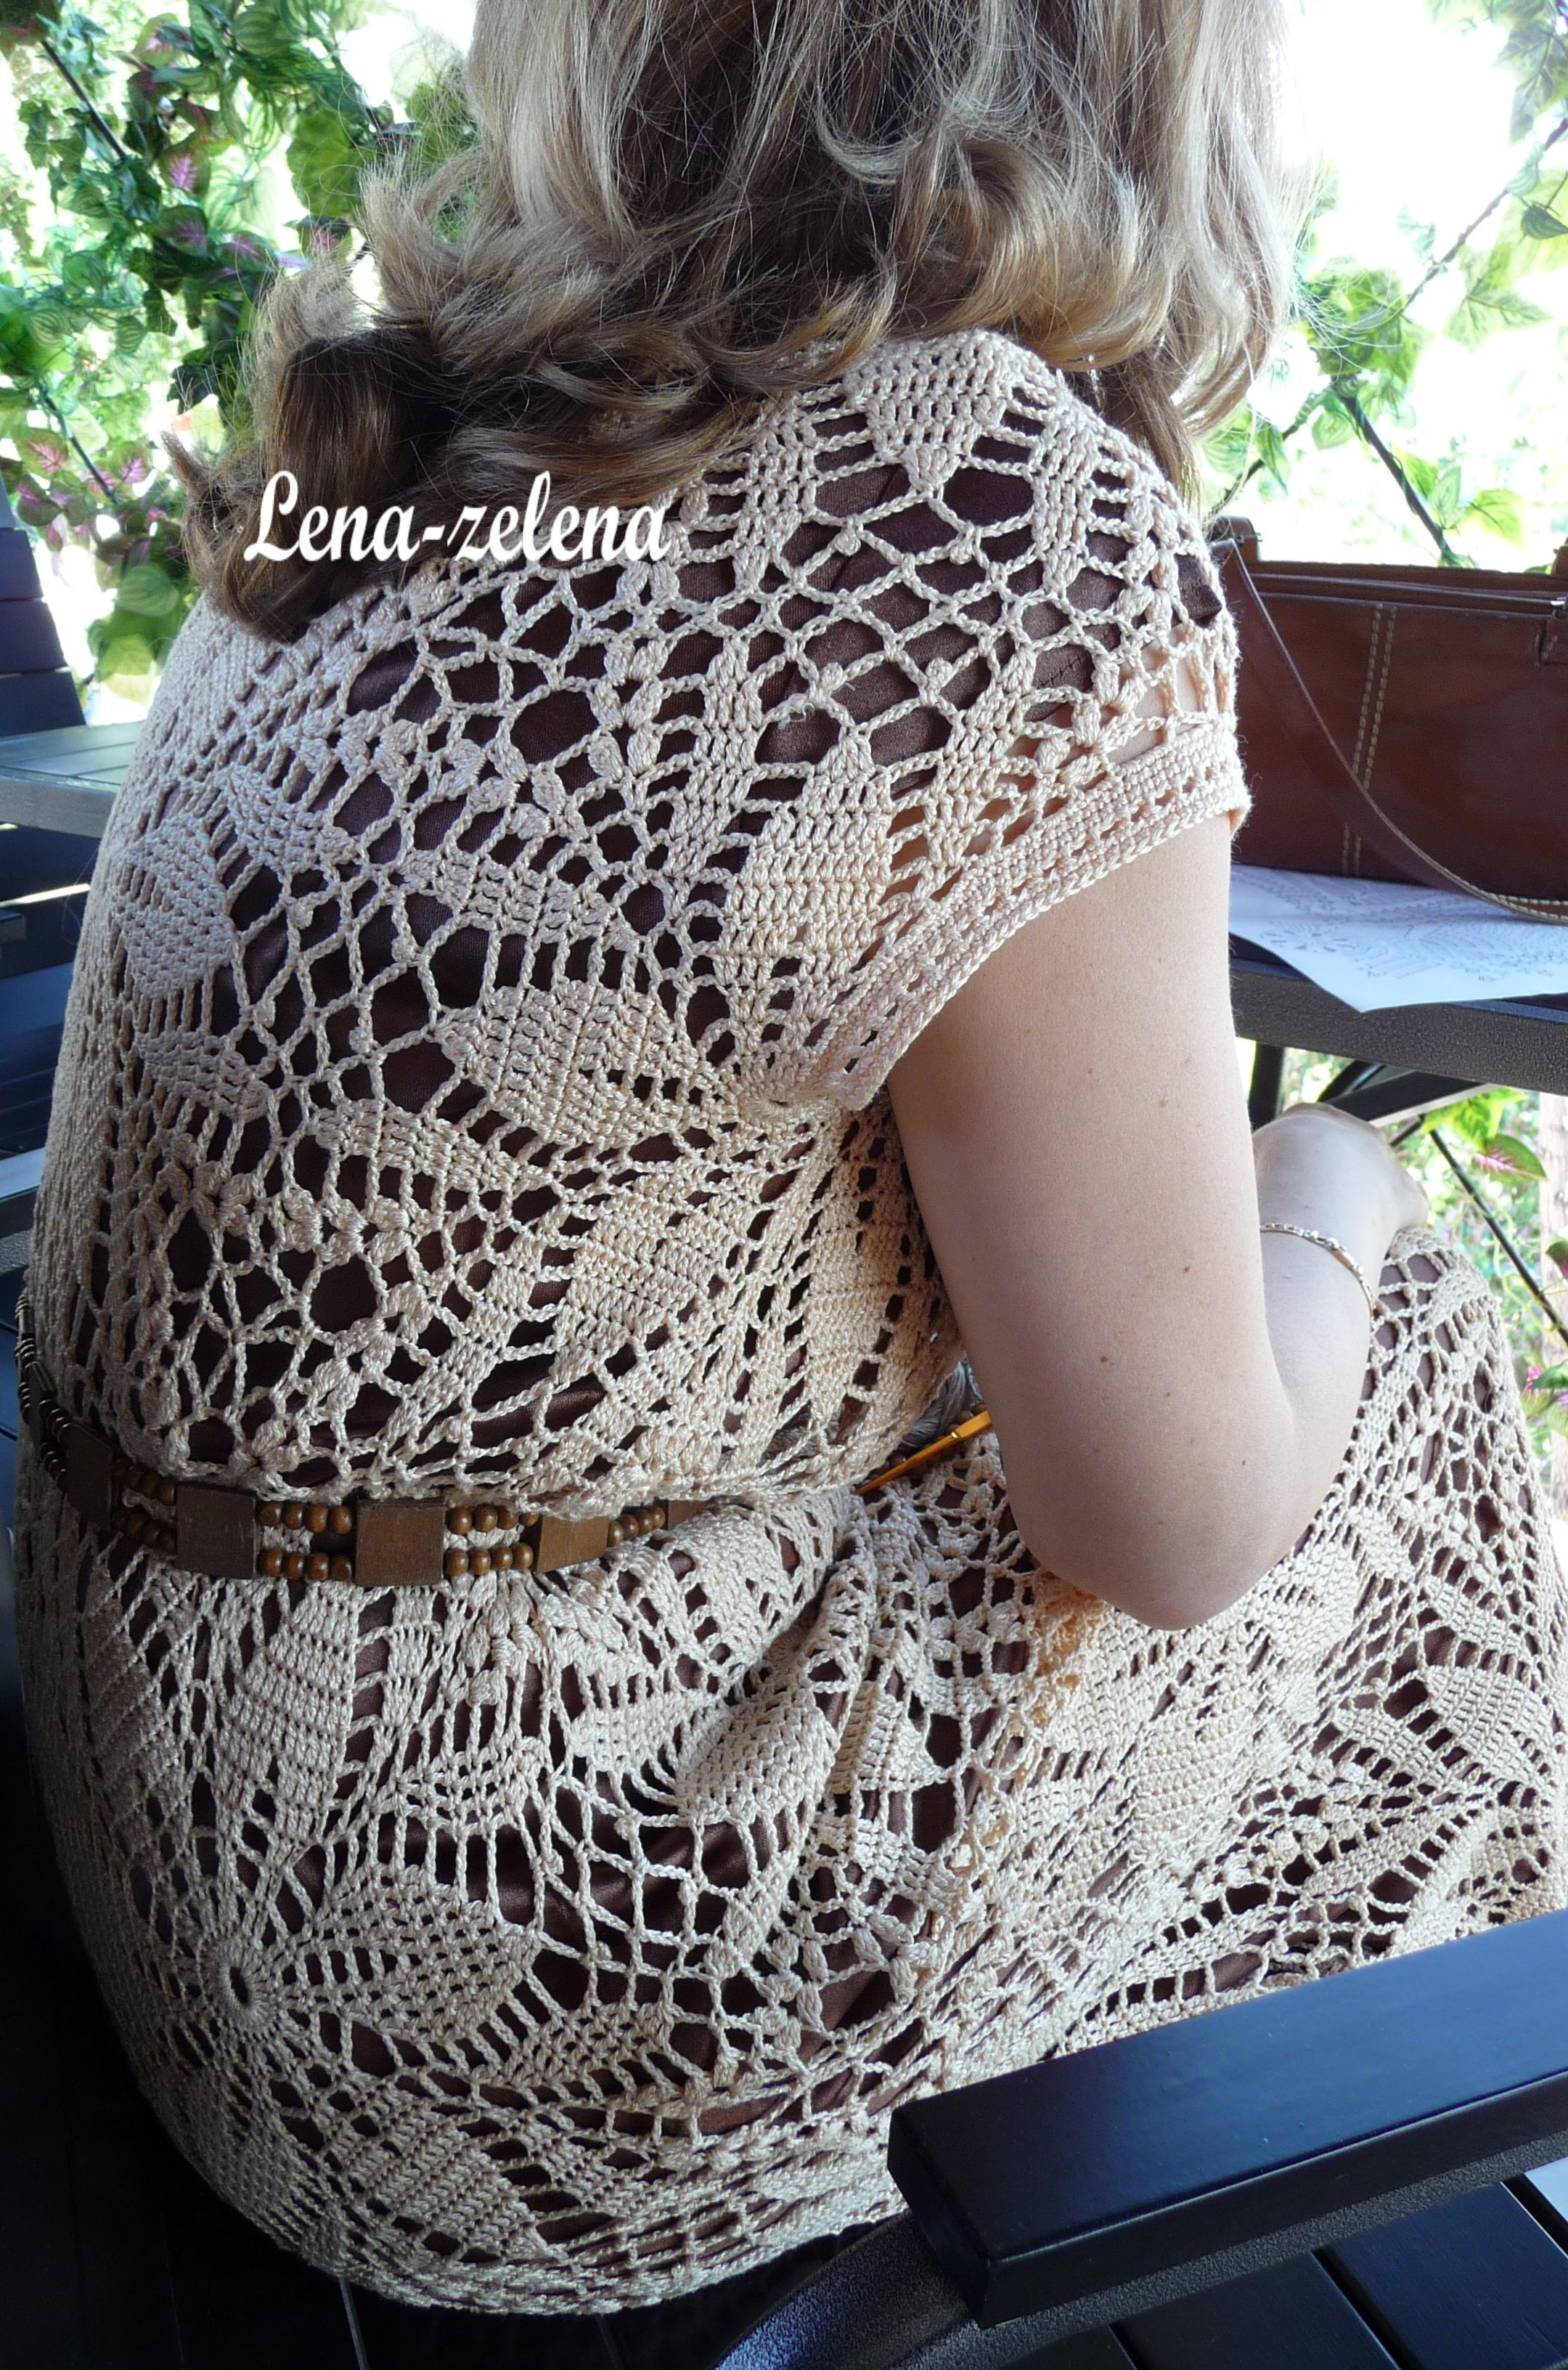 Motifs crochet dress by lena zelena on yandextki 1a crochet motifs crochet dress by lena zelena on yandextki fandeluxe Image collections